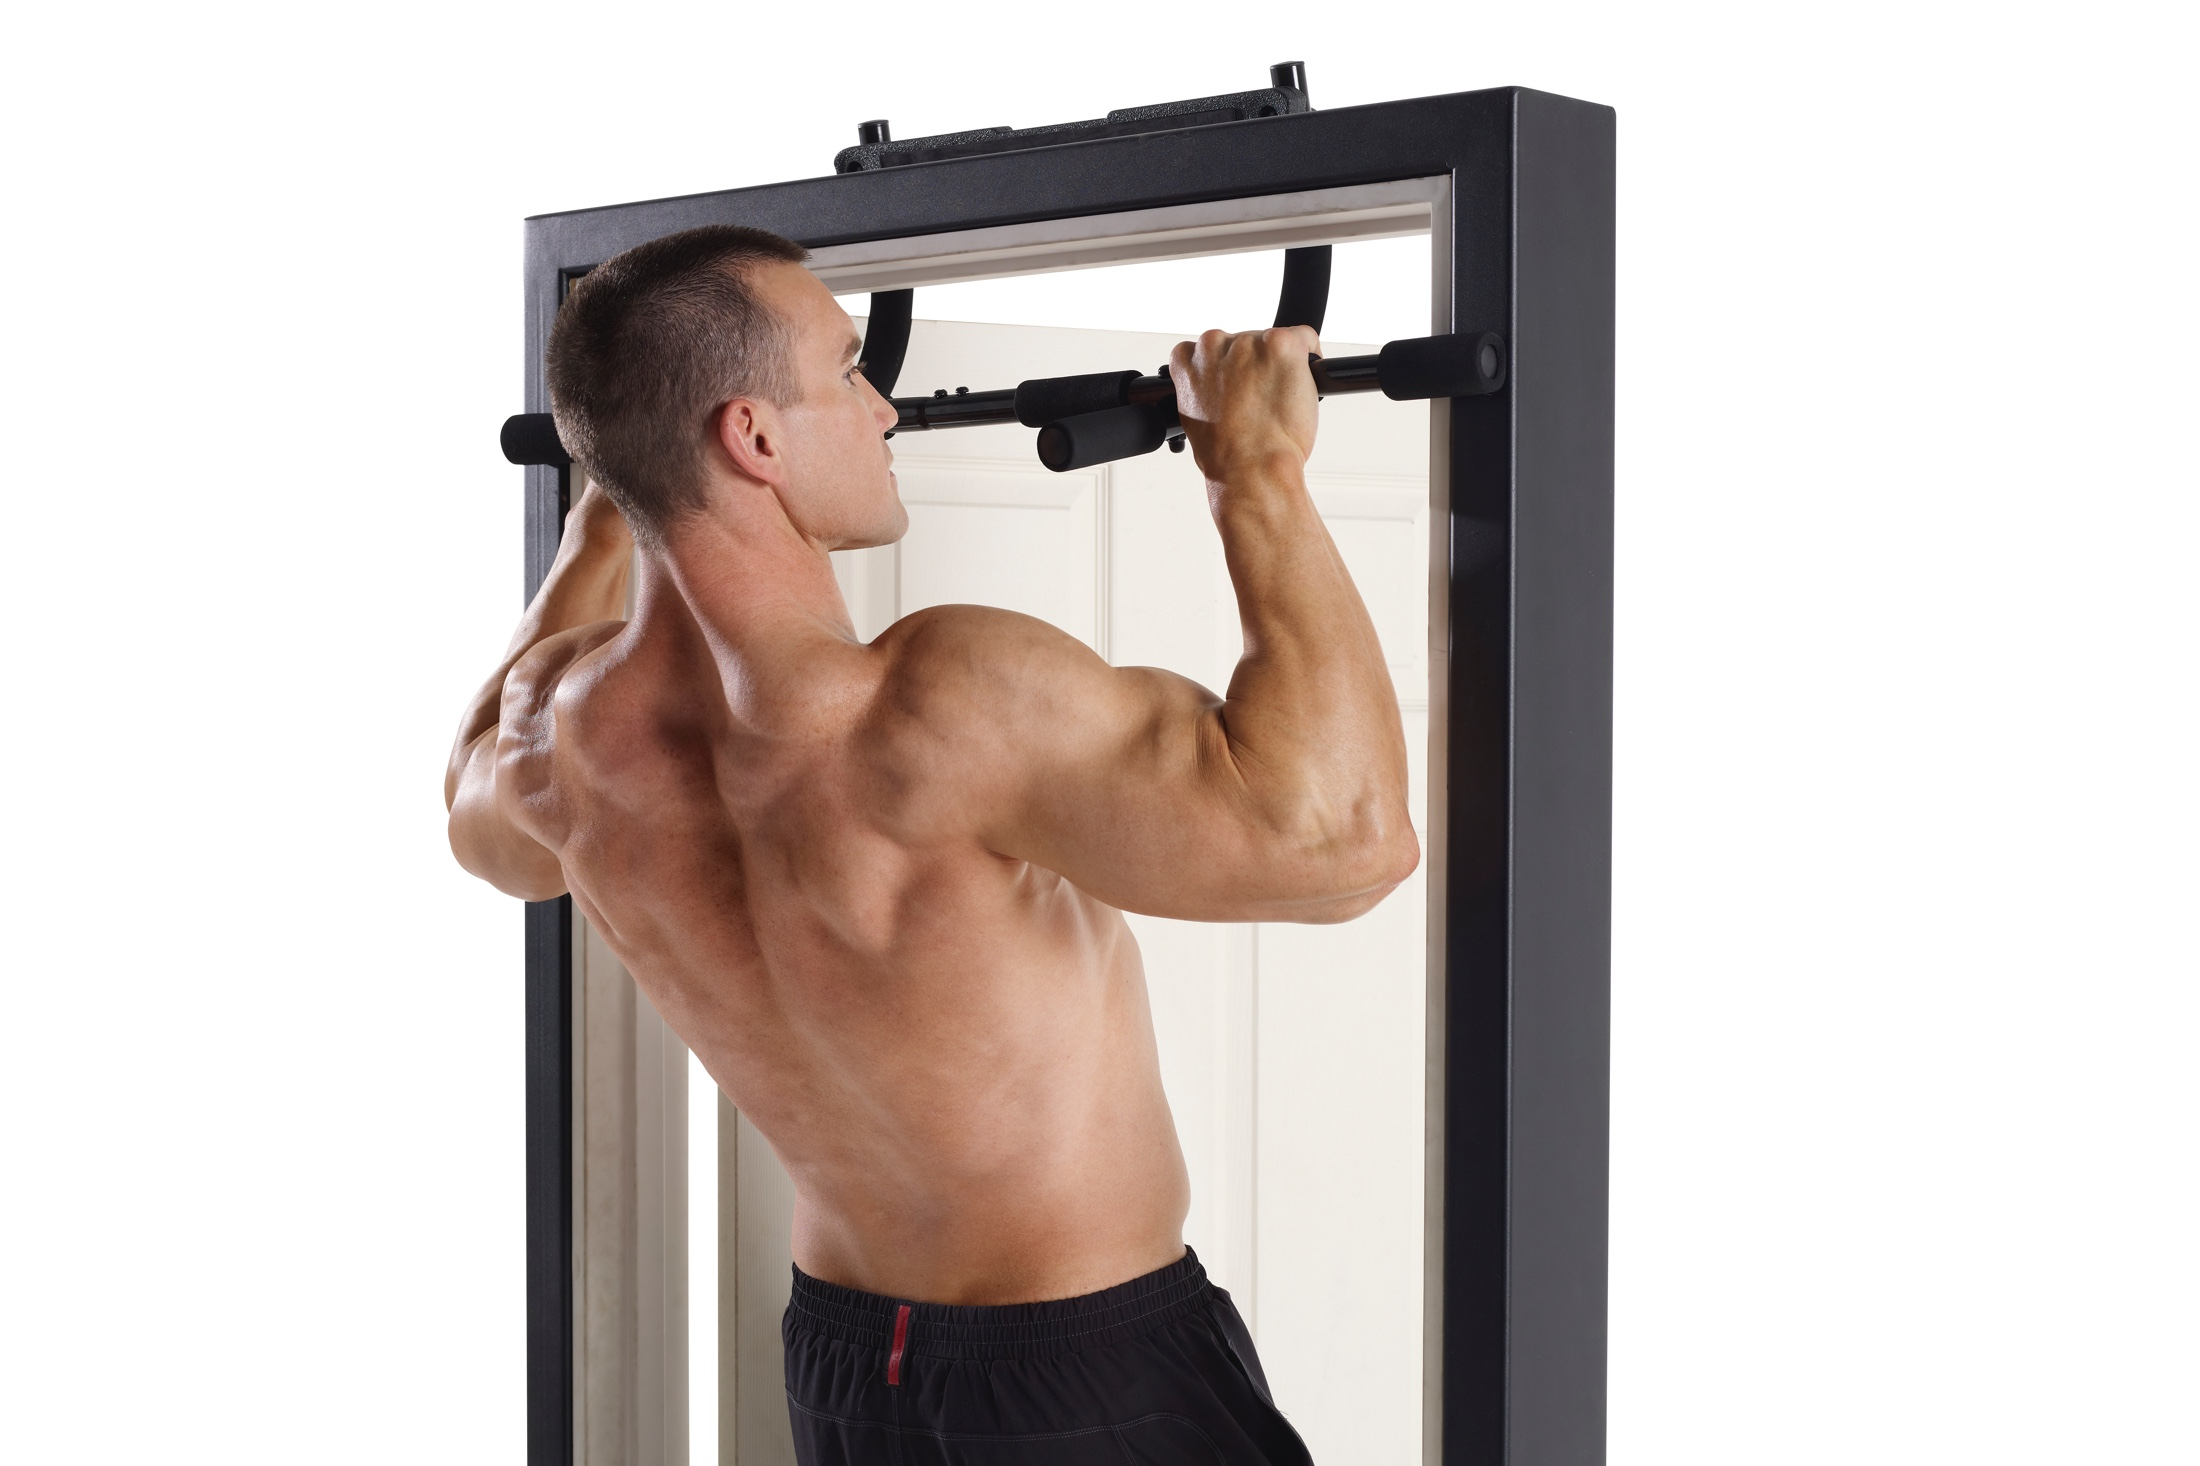 NordicTrack Gold's Gym 5-in-1 Door Gym Trainer gallery image 4